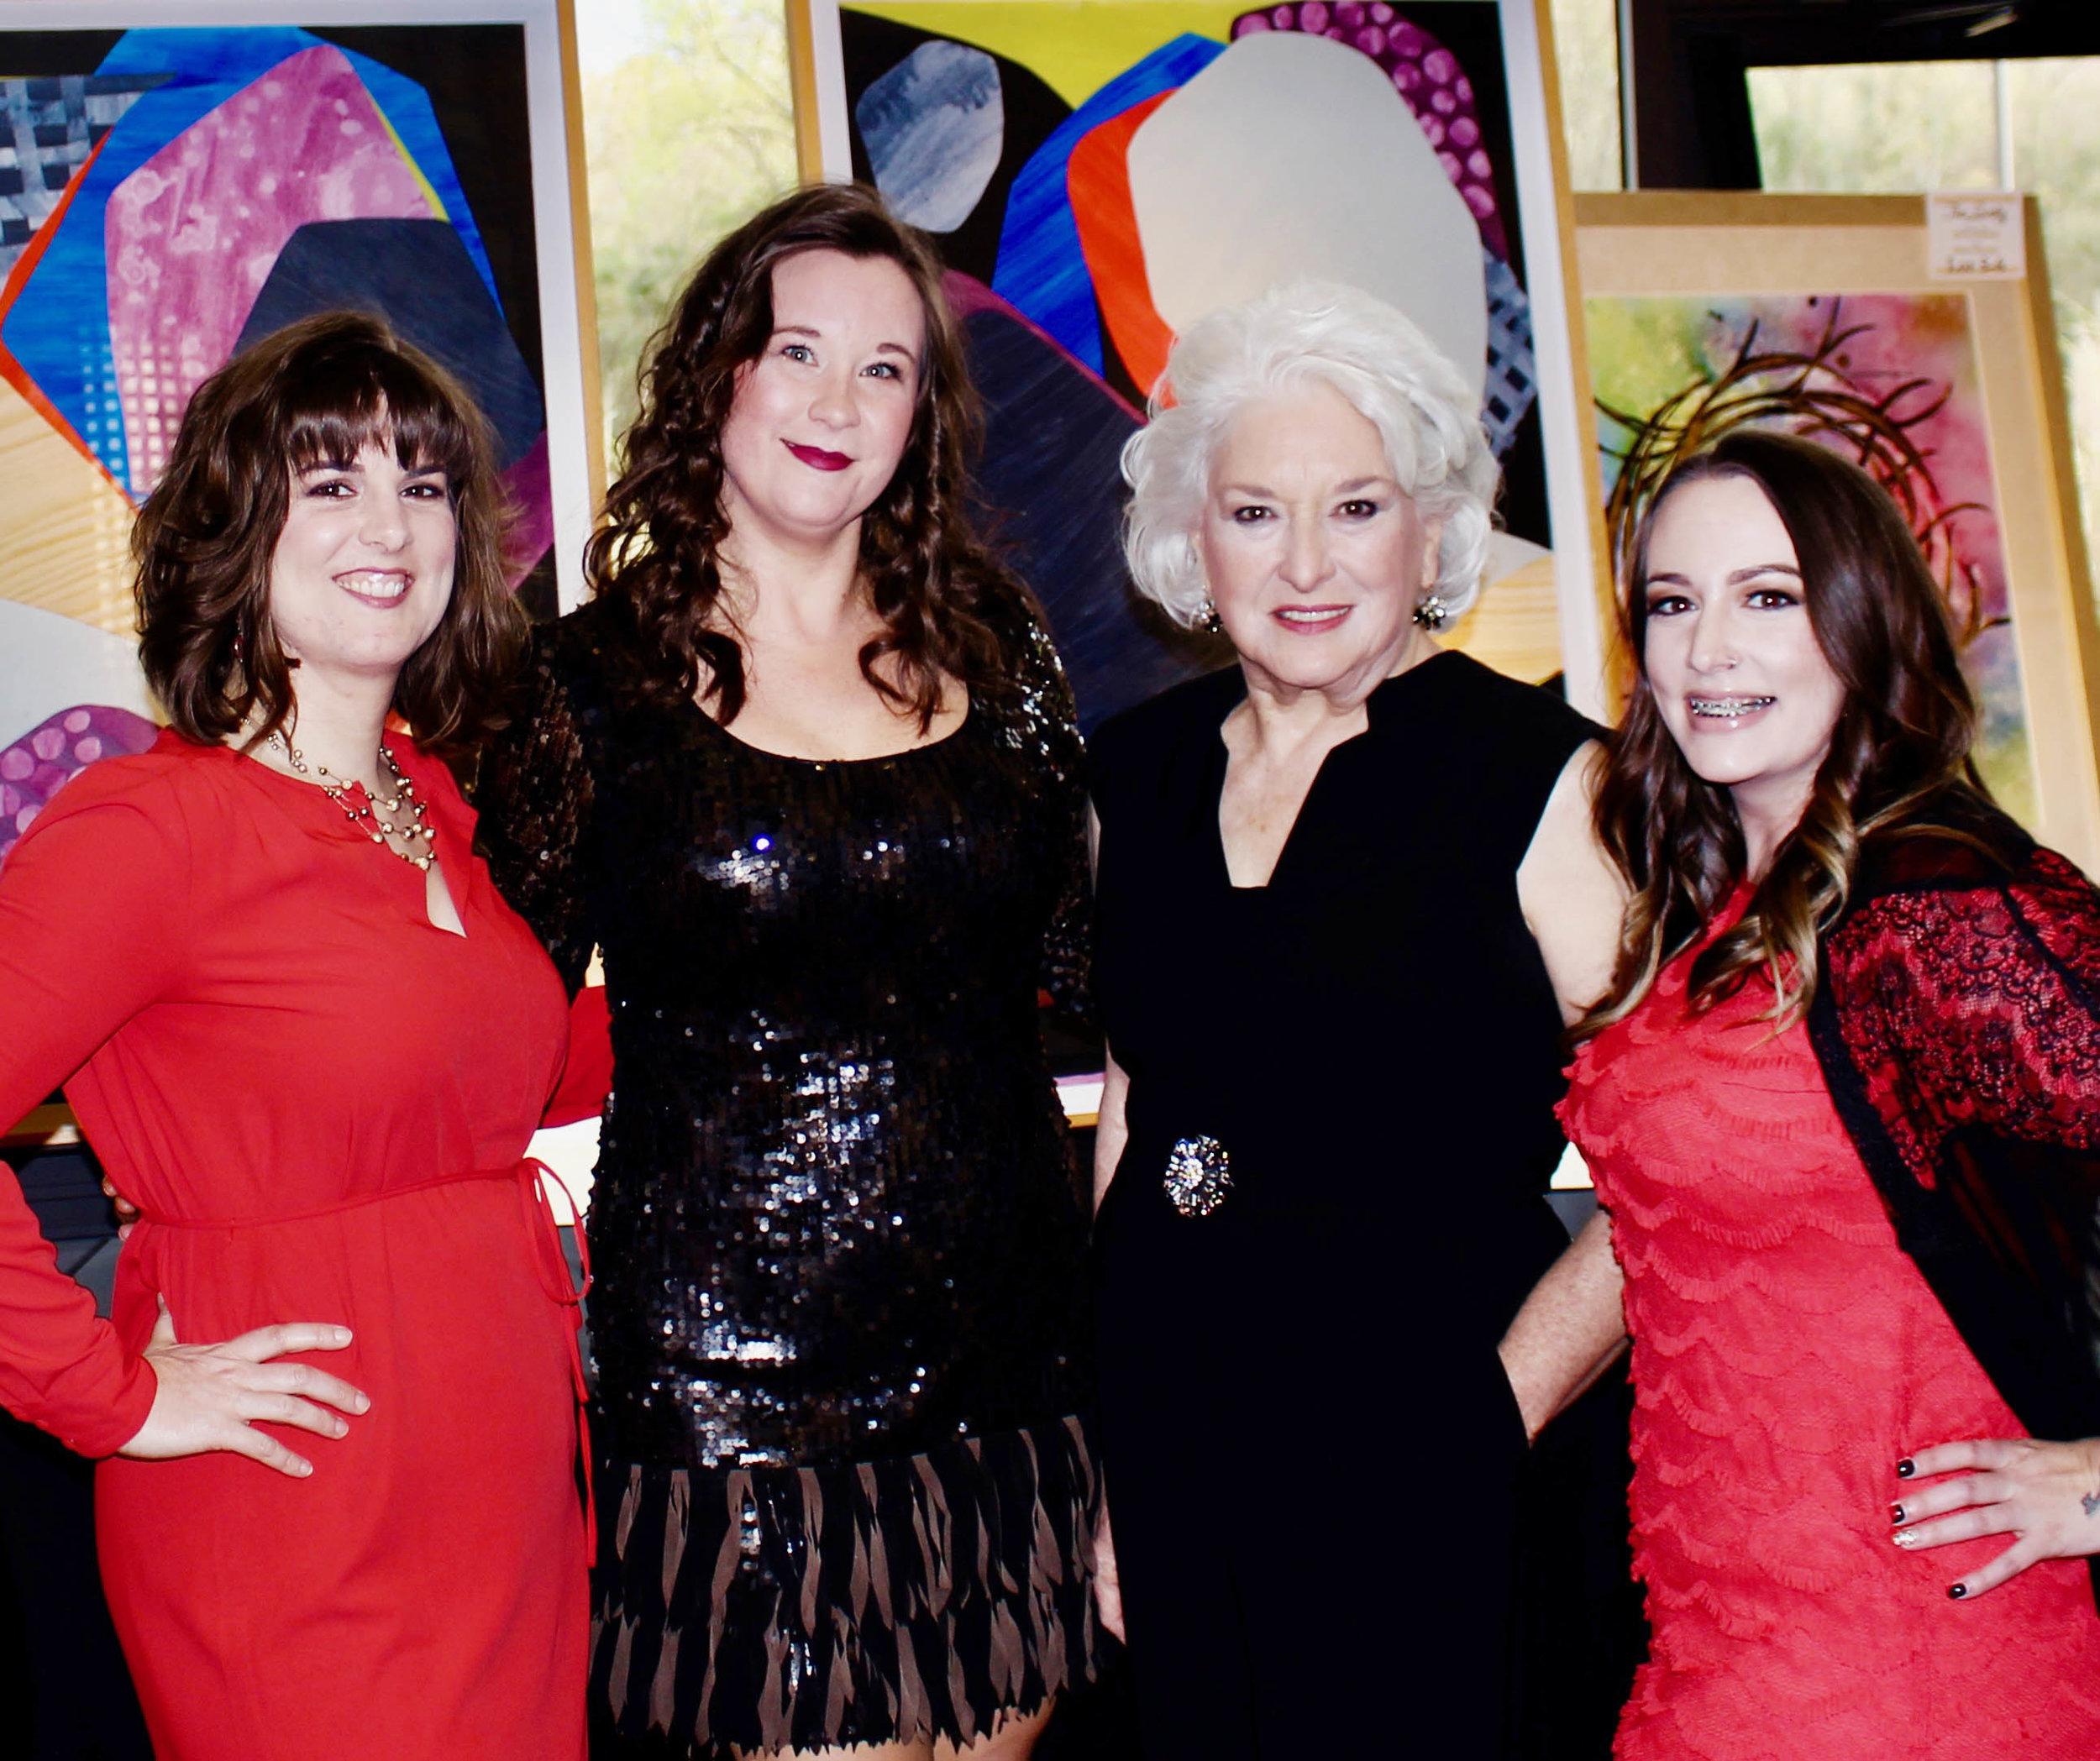 Laney Bassham, Brooke Hopkins, Margaret Ransom and Taylor Chronister